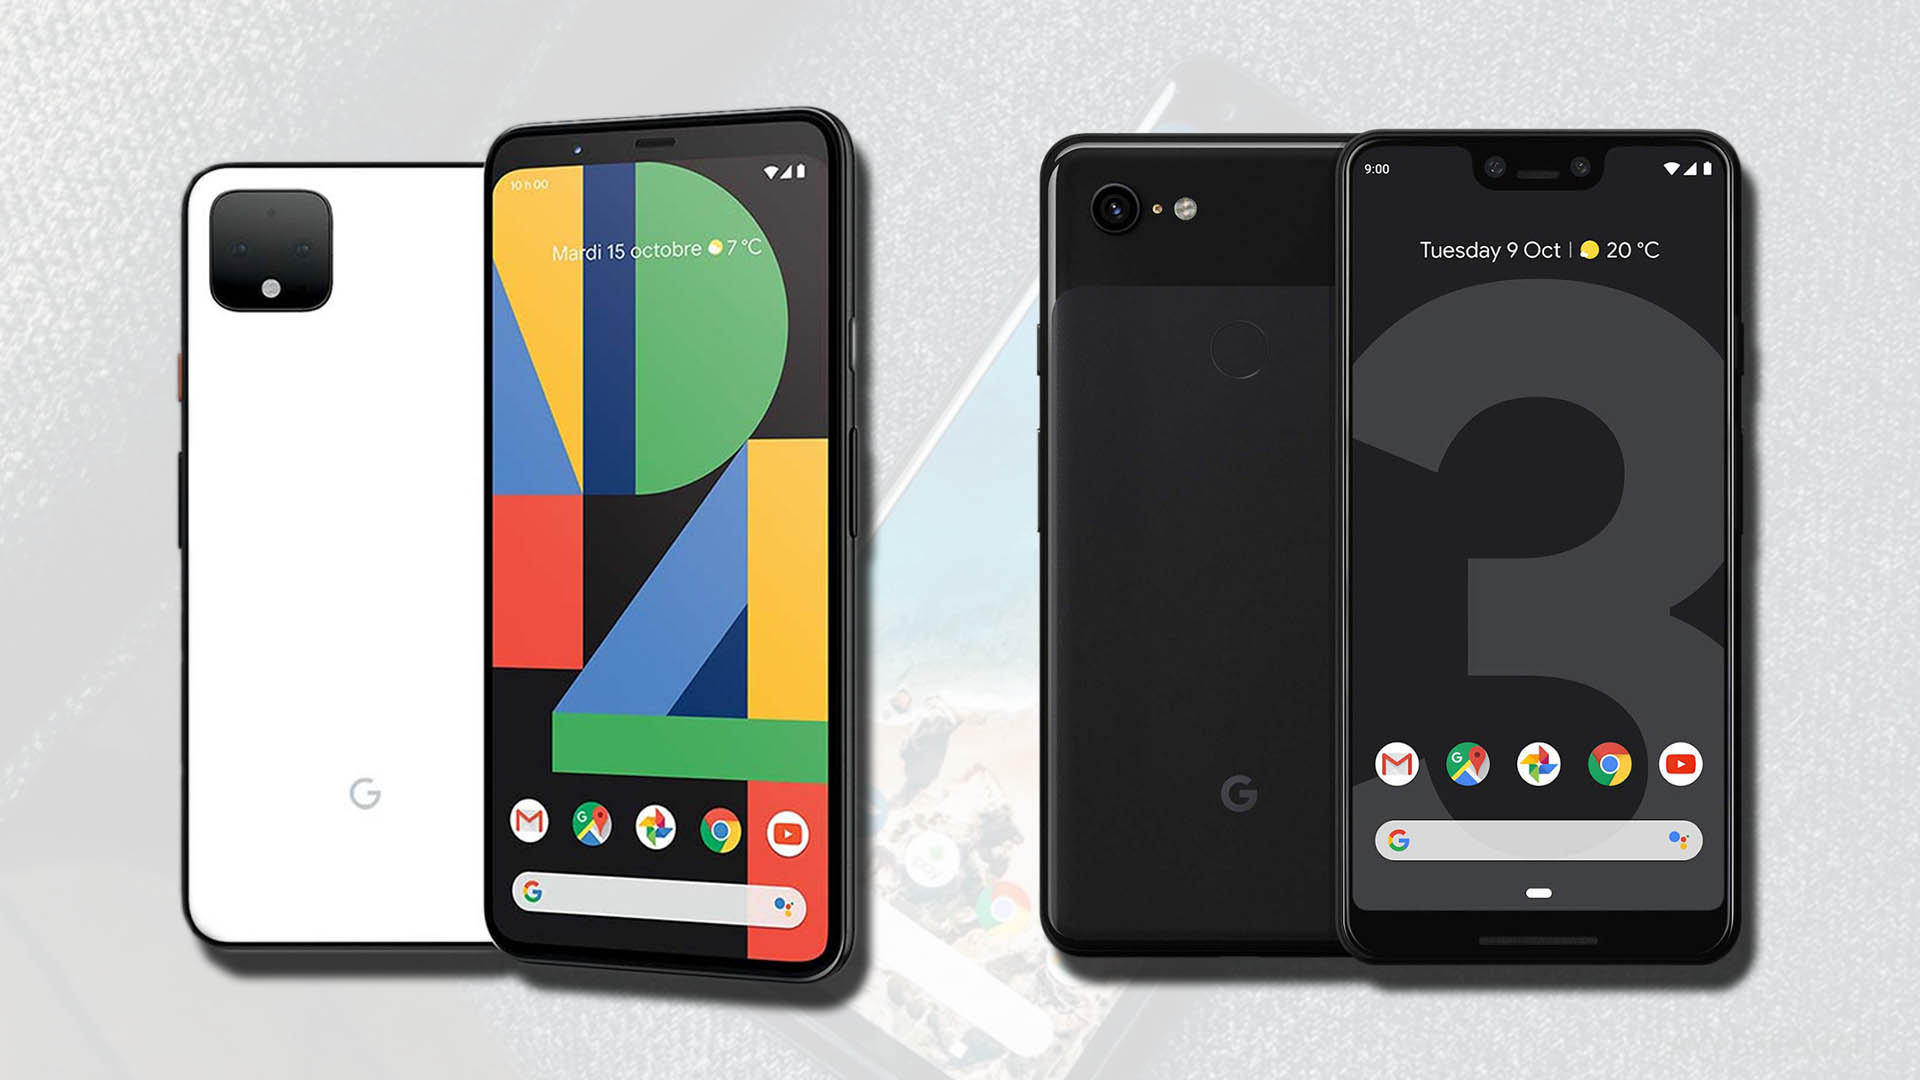 Google pixel 4 specification